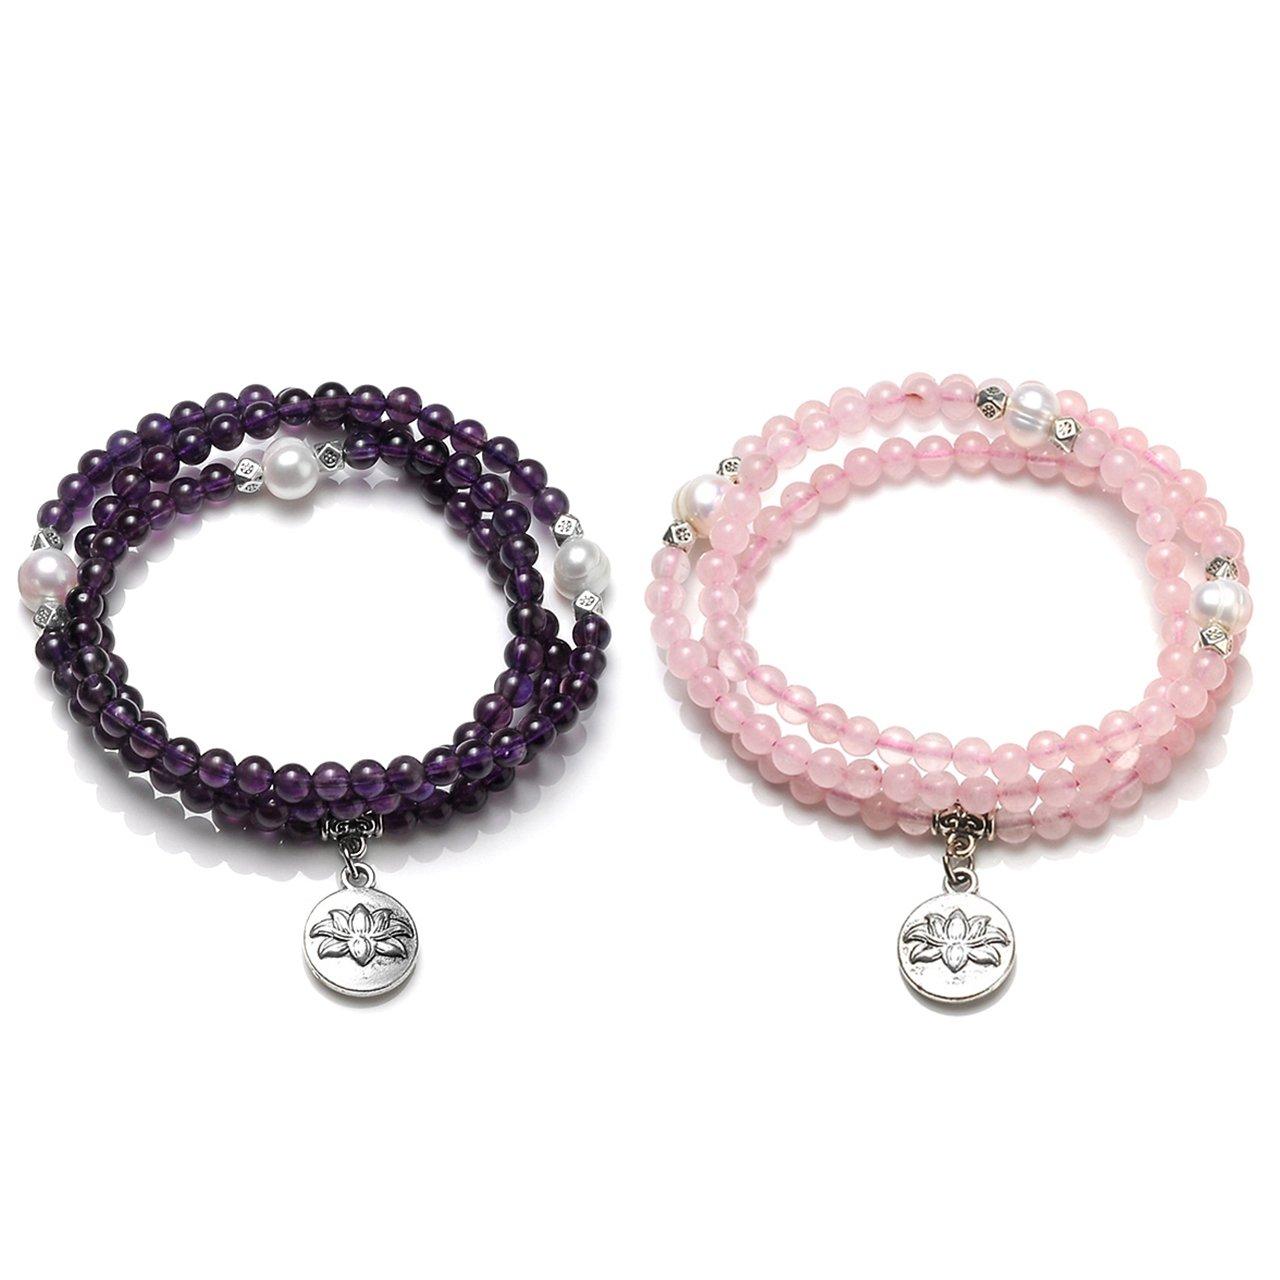 Top Plaza 4mm Tibetan Buddhist Natural Amethyst Rose Quartz Pearl Healing Crystal Gemstone 108 Mala Prayer Beads Stretch Bracelet Necklace with Lotus Charm